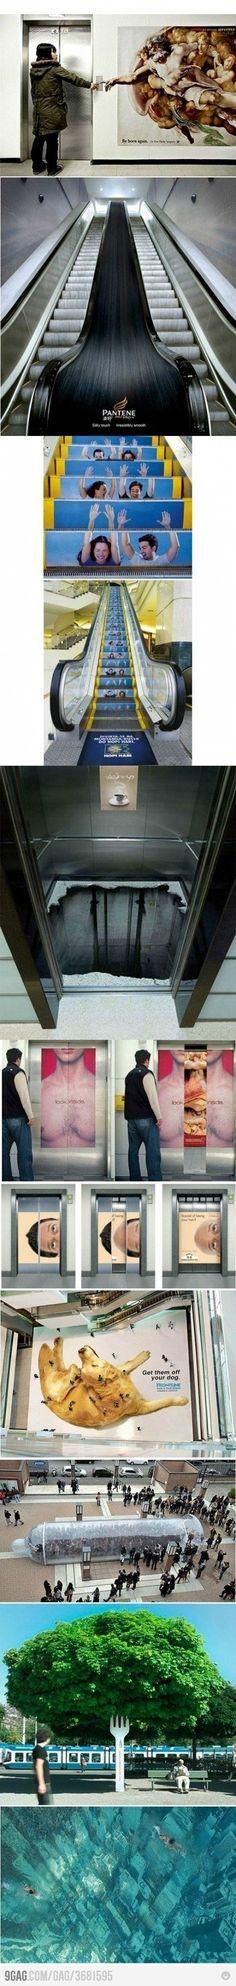 kreative ads